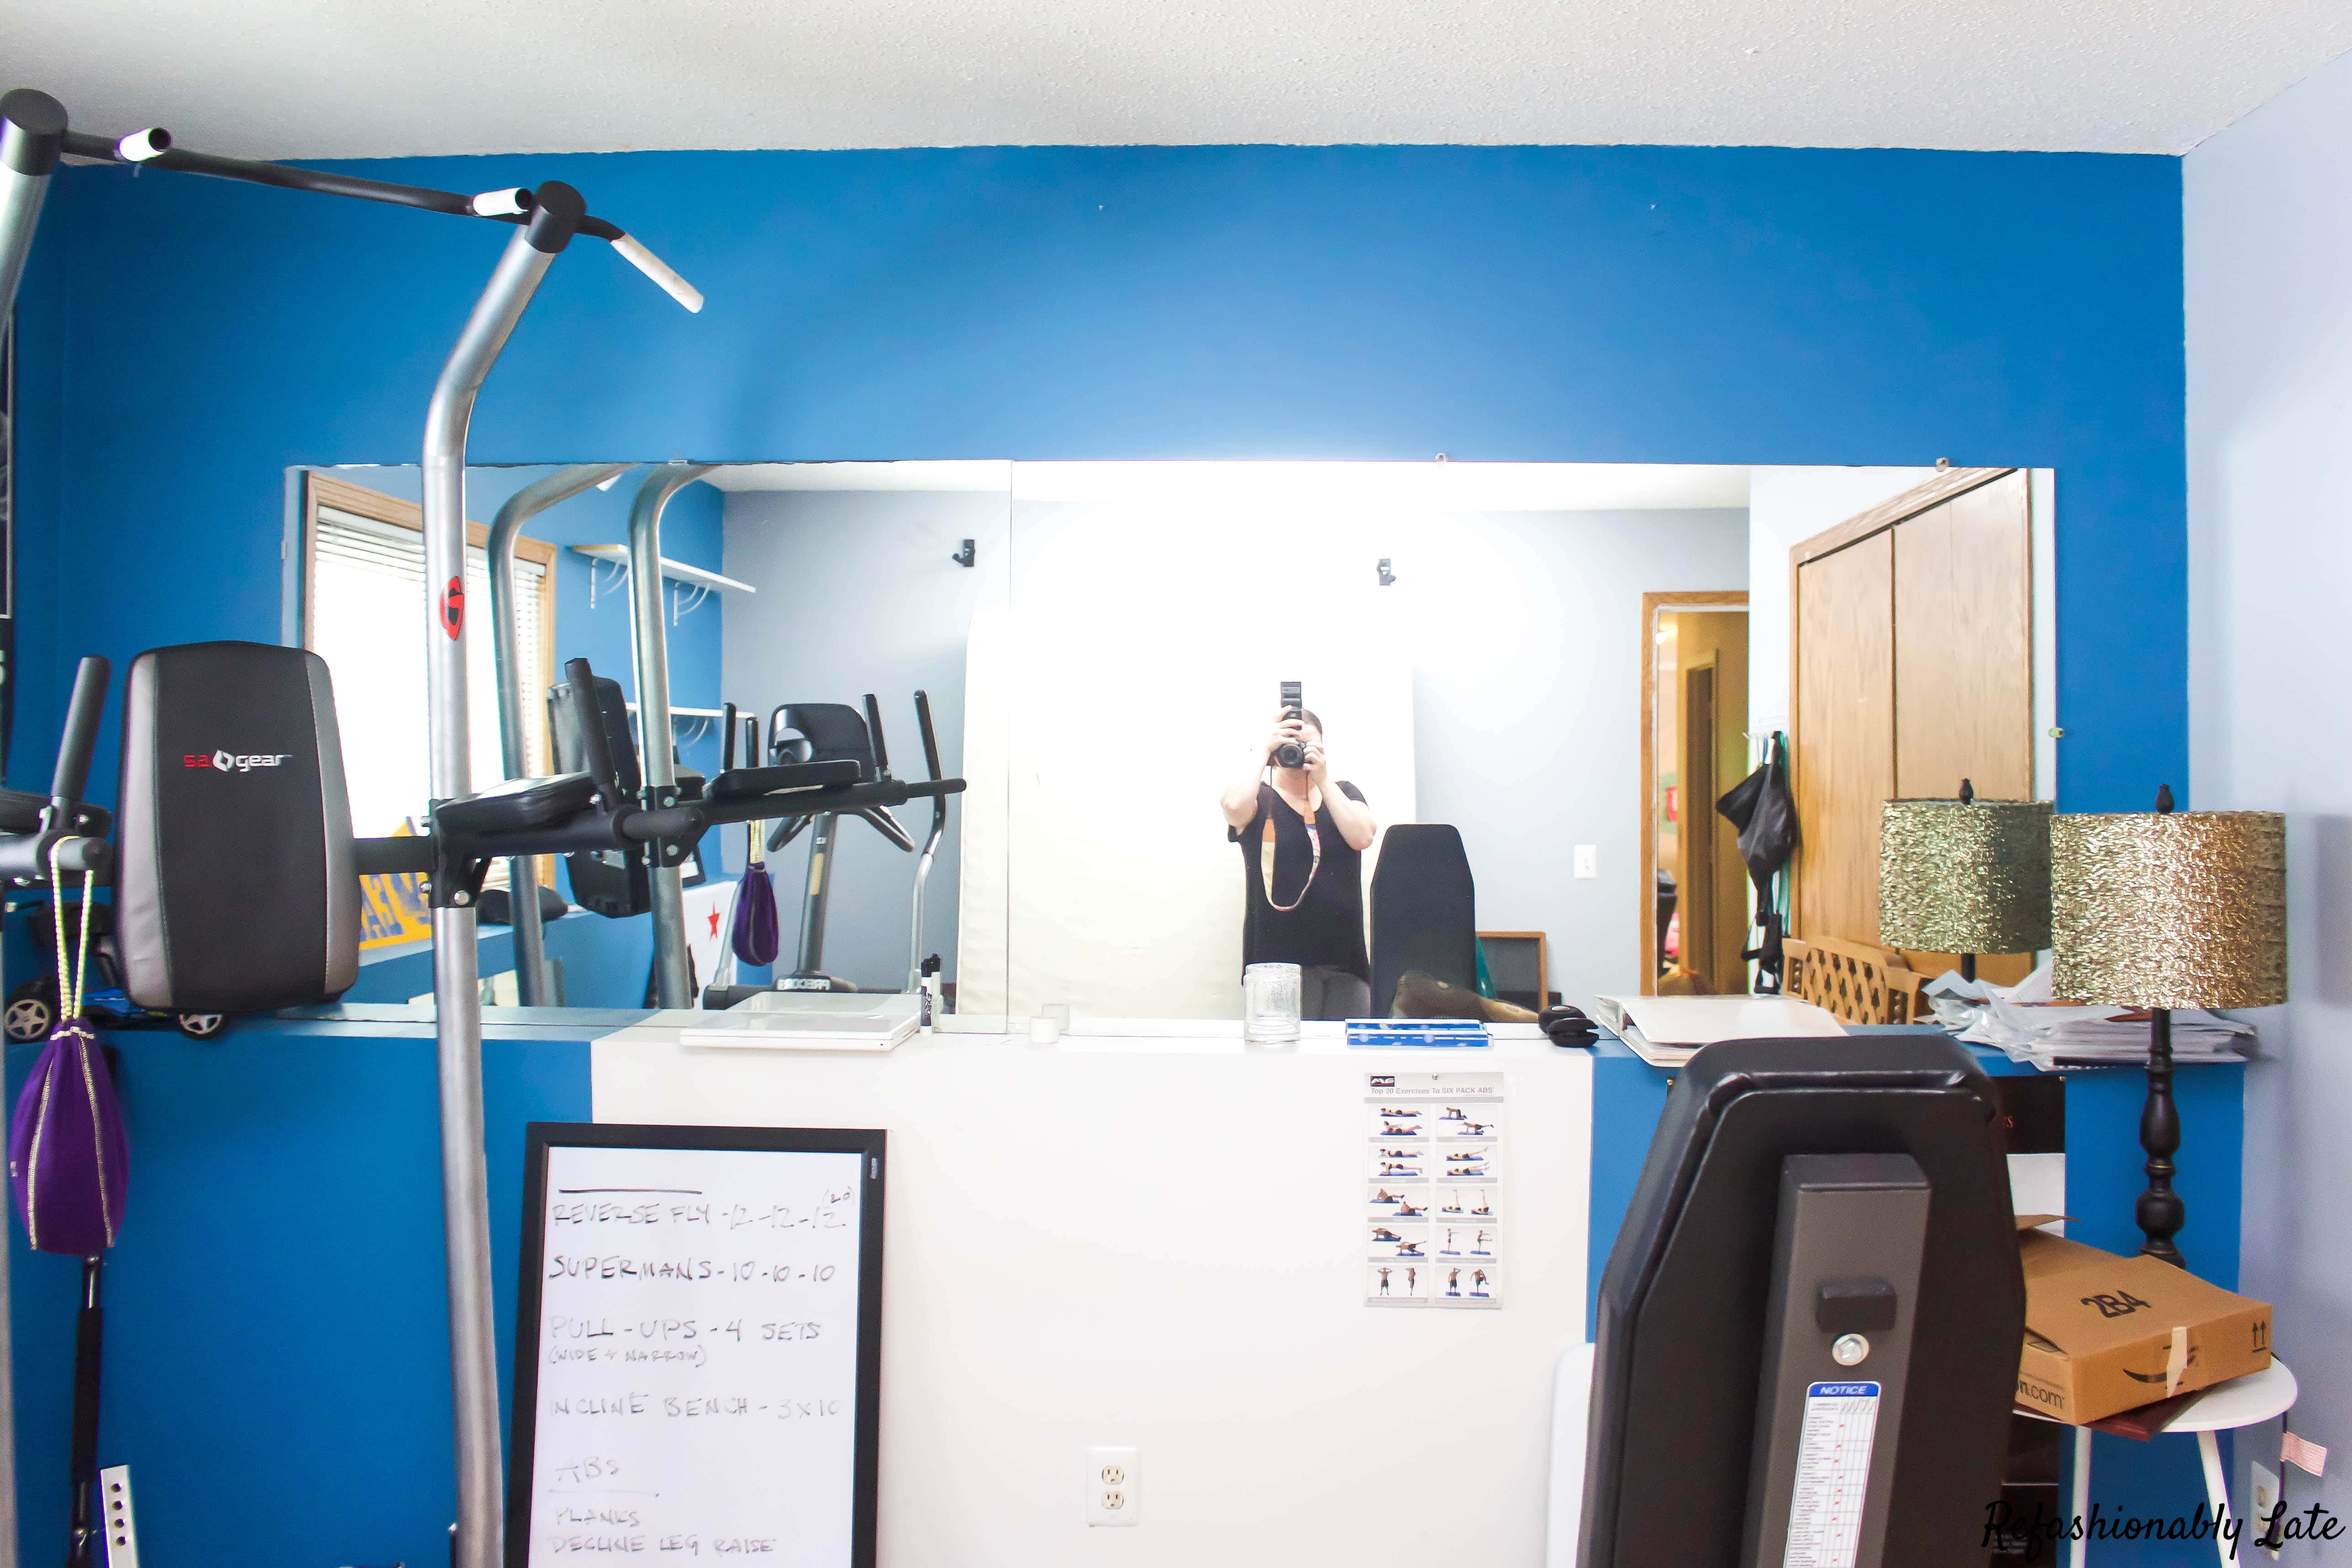 One Room Challenge Final Reveal Gym/Guest Room - www.refashionablylate.com